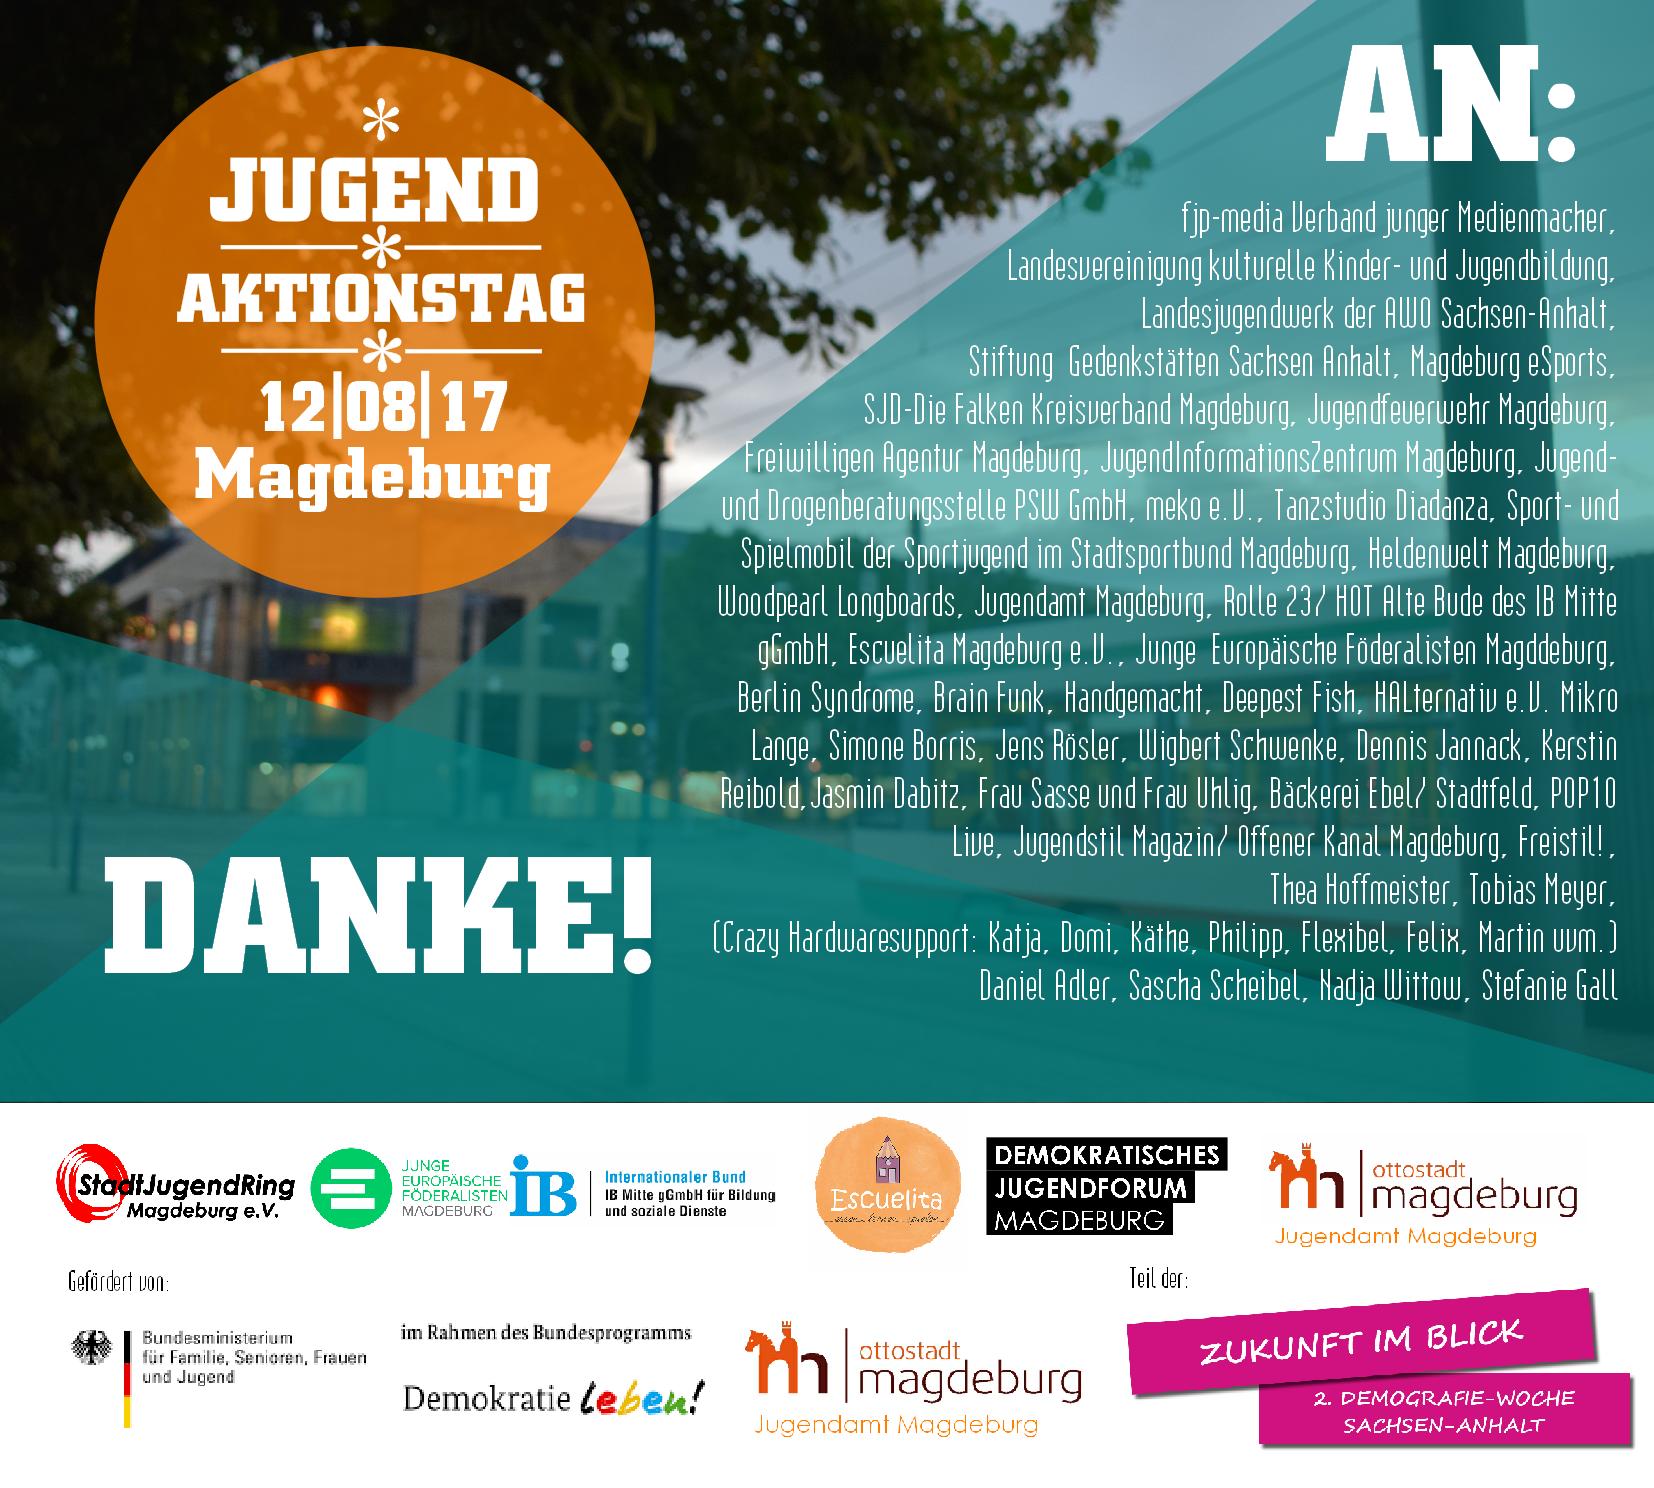 https://www.sjr-magdeburg.de/wp-content/uploads/2017/08/DANKE.png